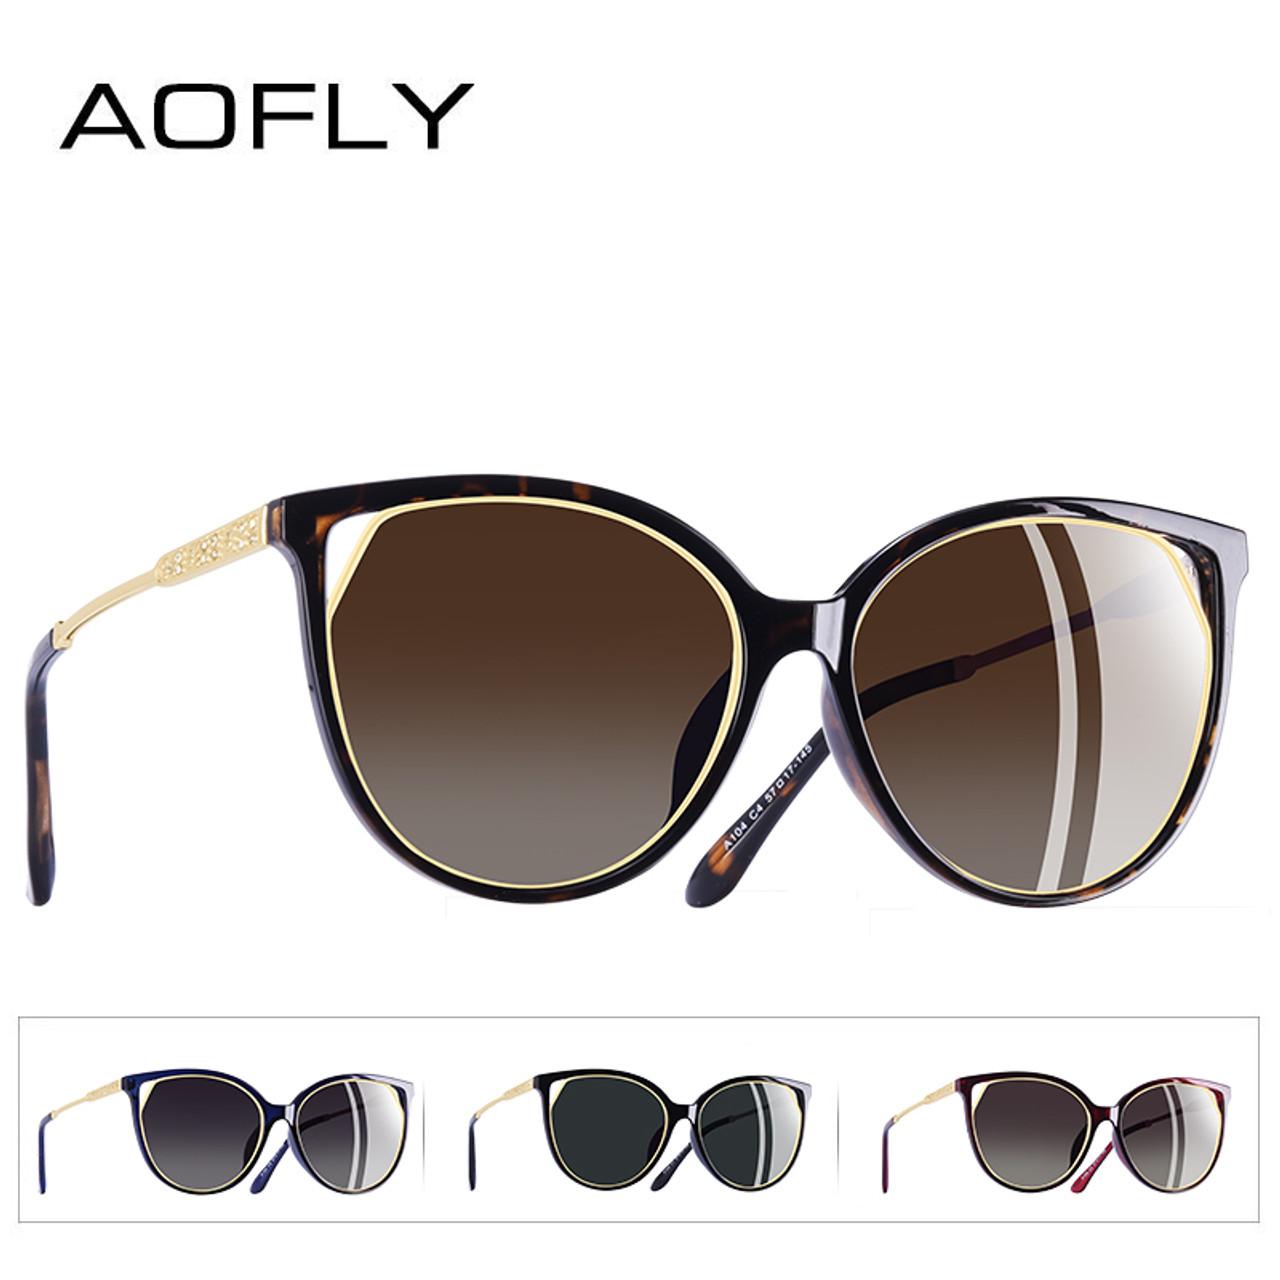 b5a7cf3d0a3 ... AOFLY BRAND DESIGN Fashion Sunglasses 2018 Polarized Cat Eye Sun Glasses  For Women Rhinestone Temple UV400 ...